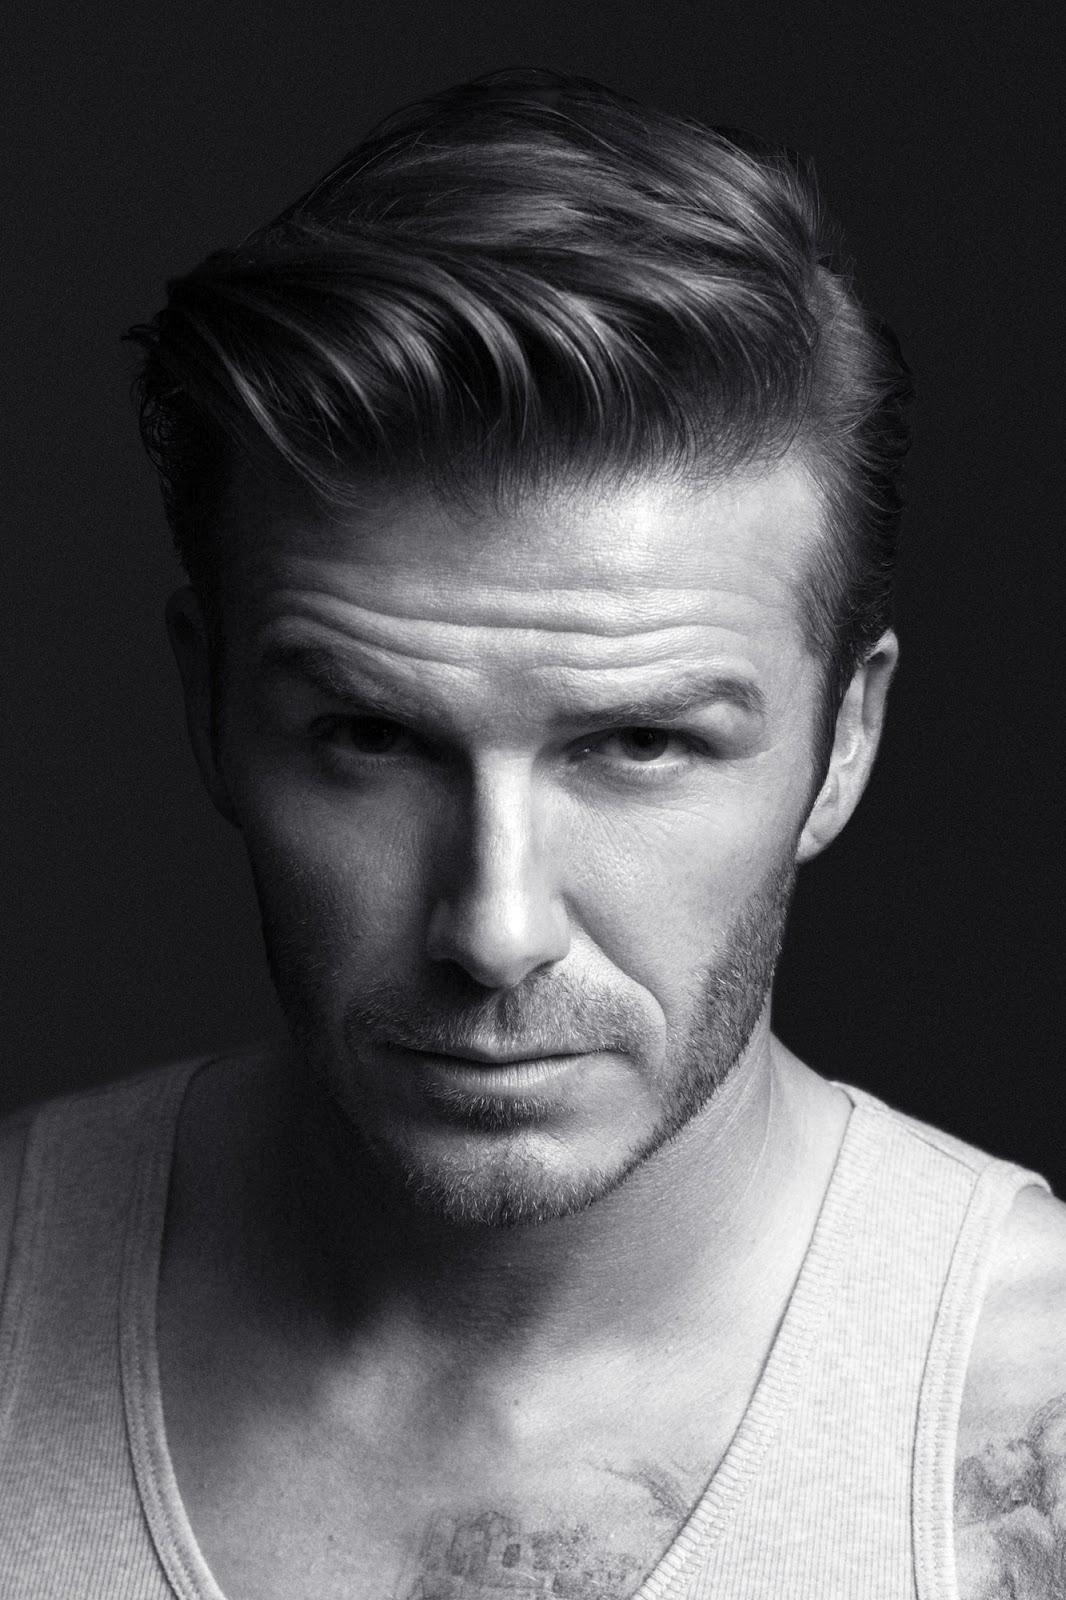 David Beckham Hairstyles